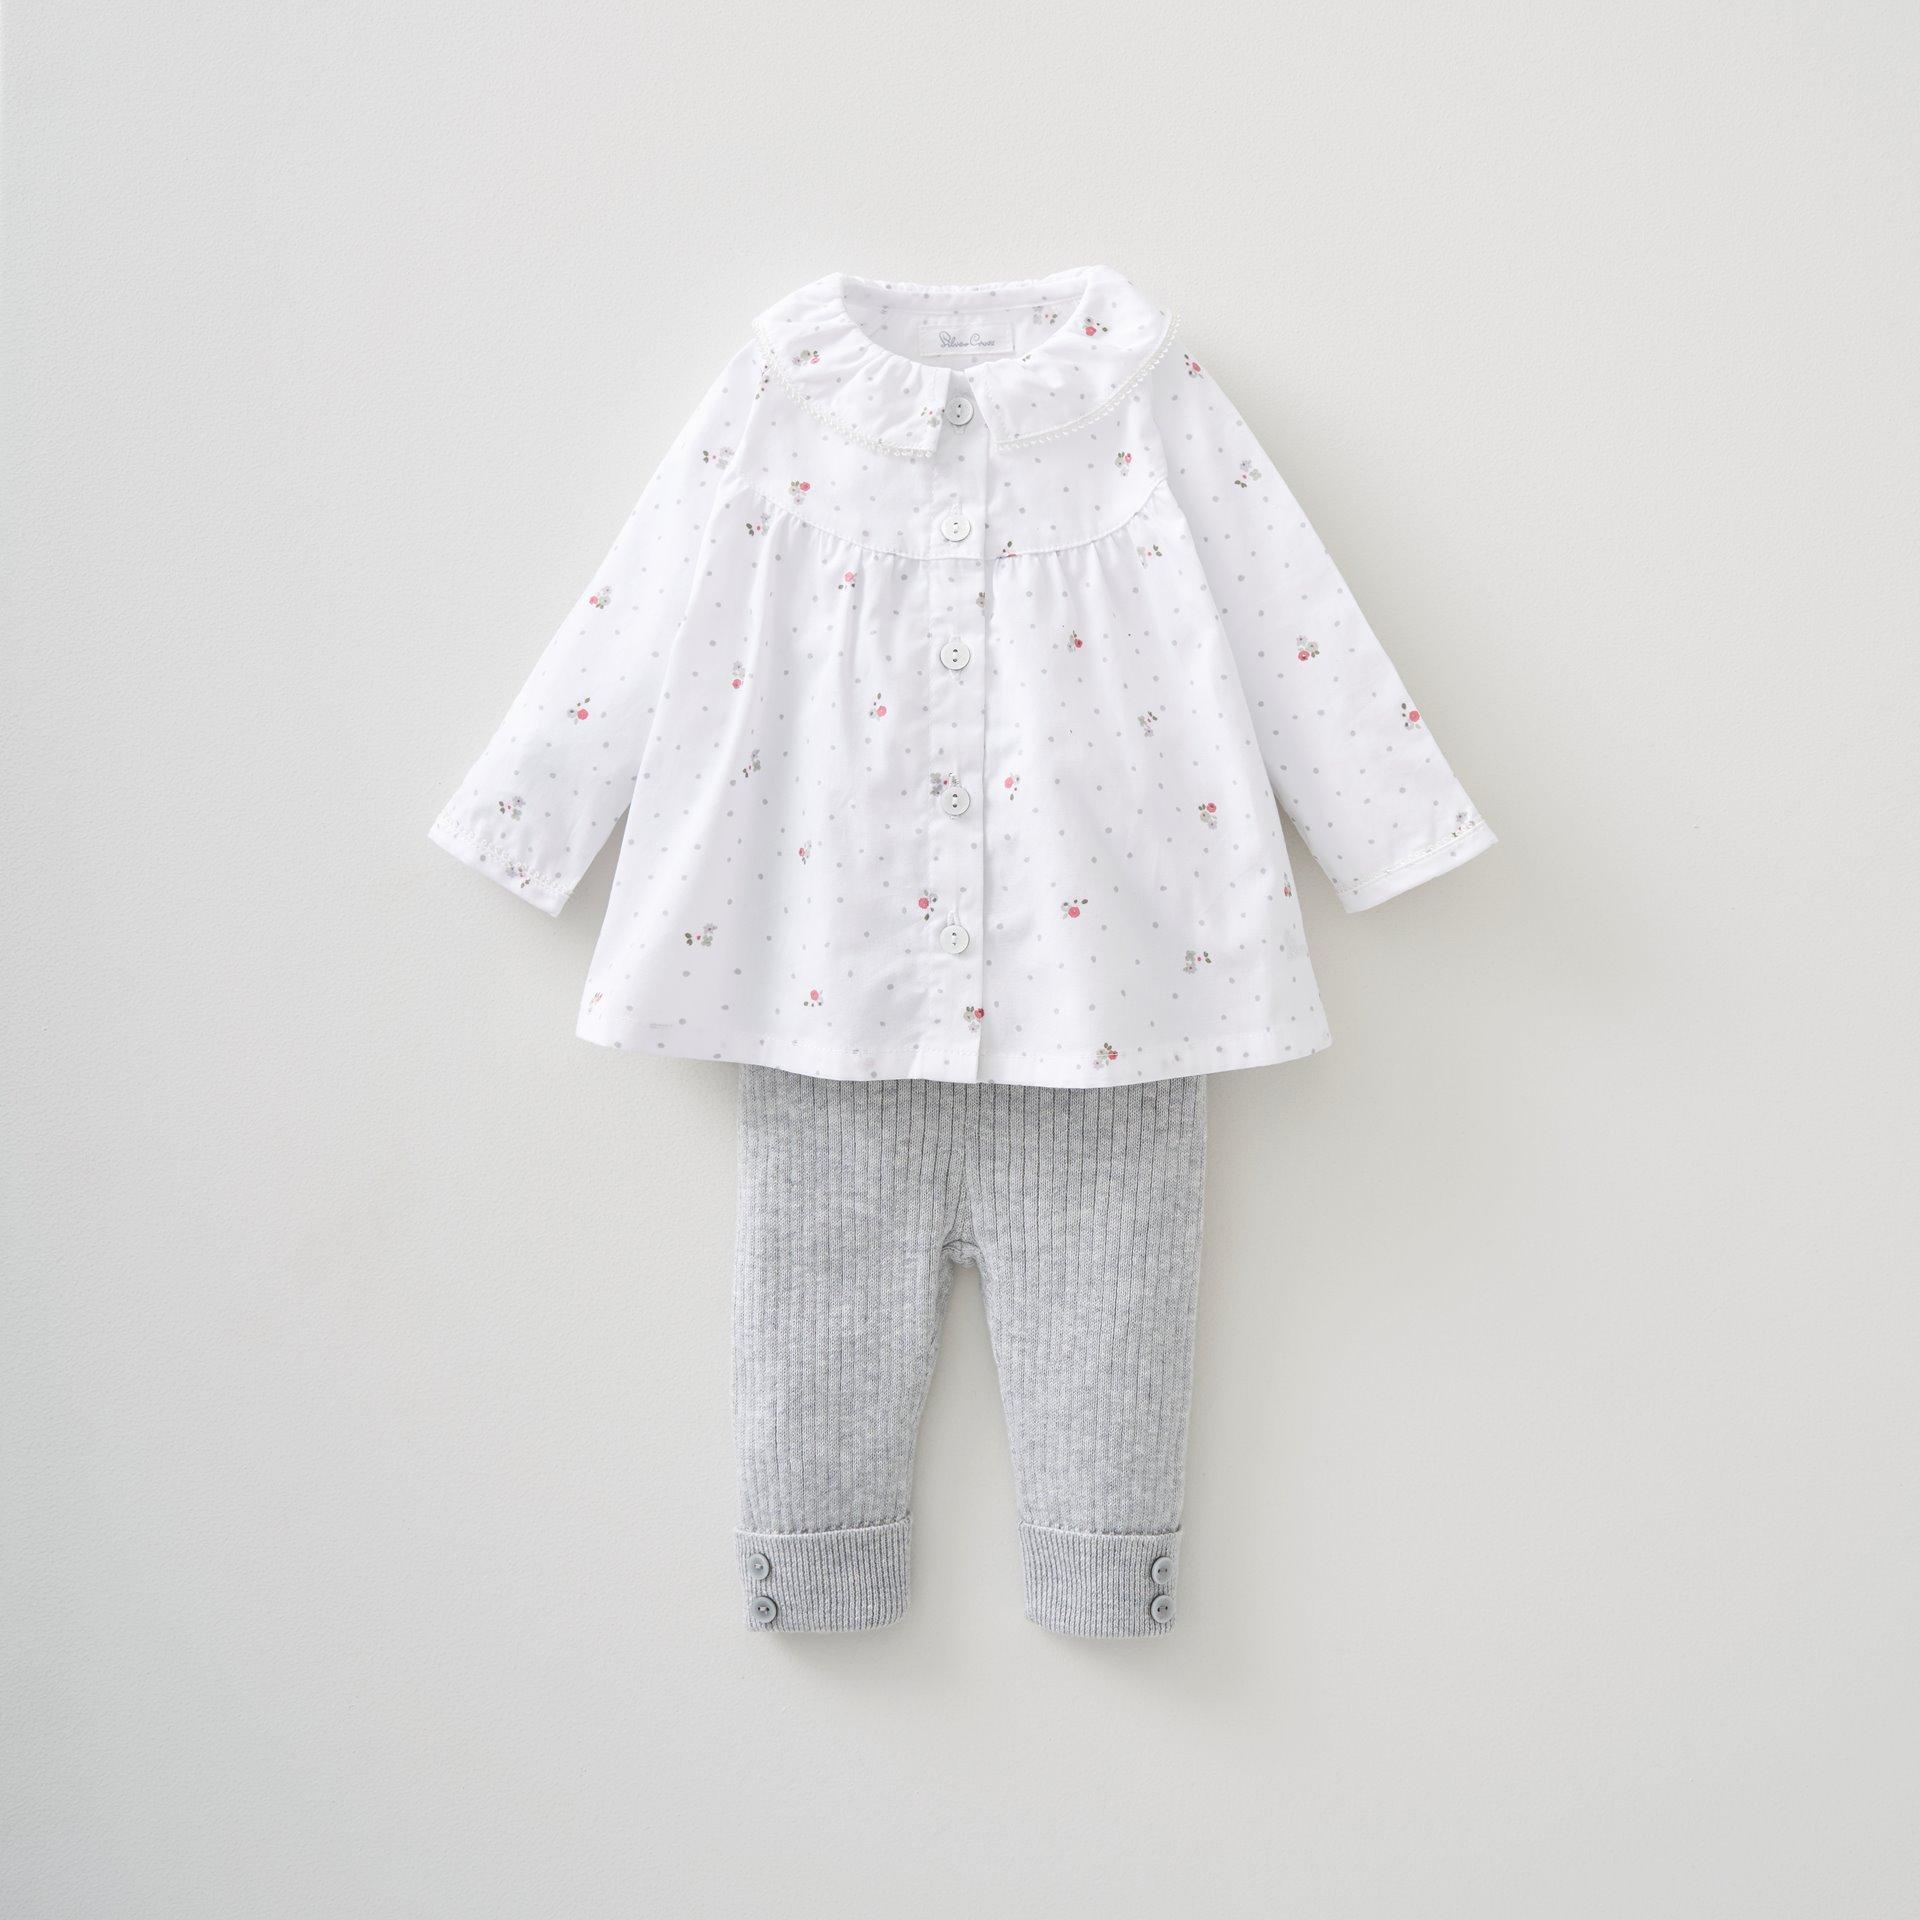 Blouse & Knitted Leggings Set 3-6 Months